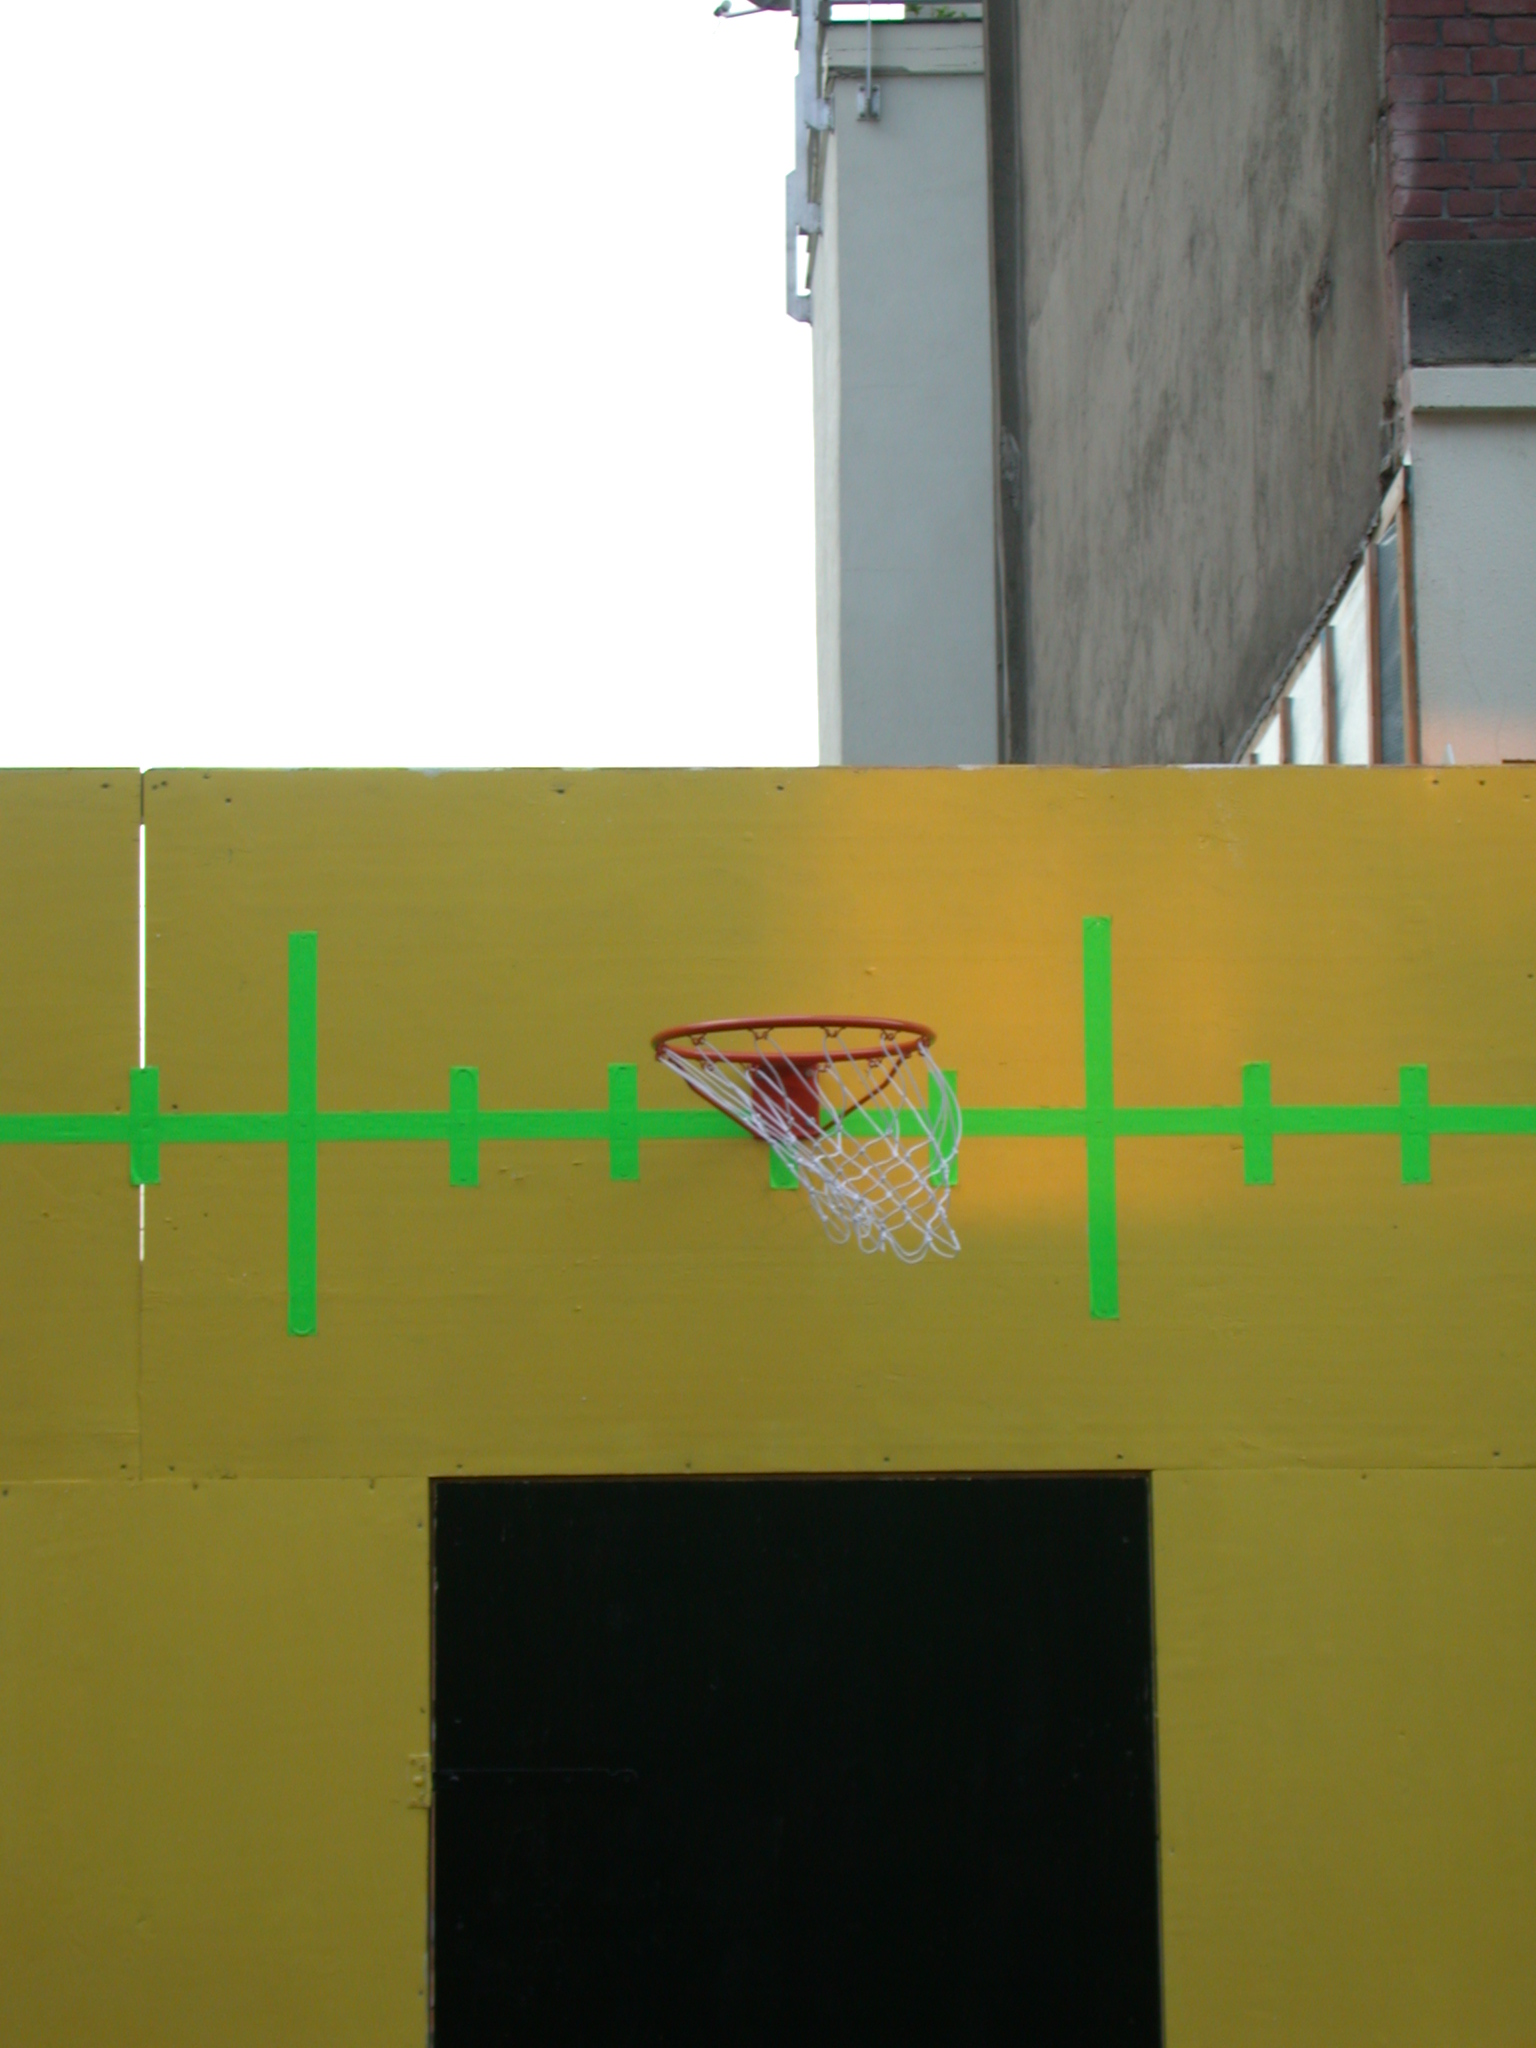 basketball hoop on yellow wall sports